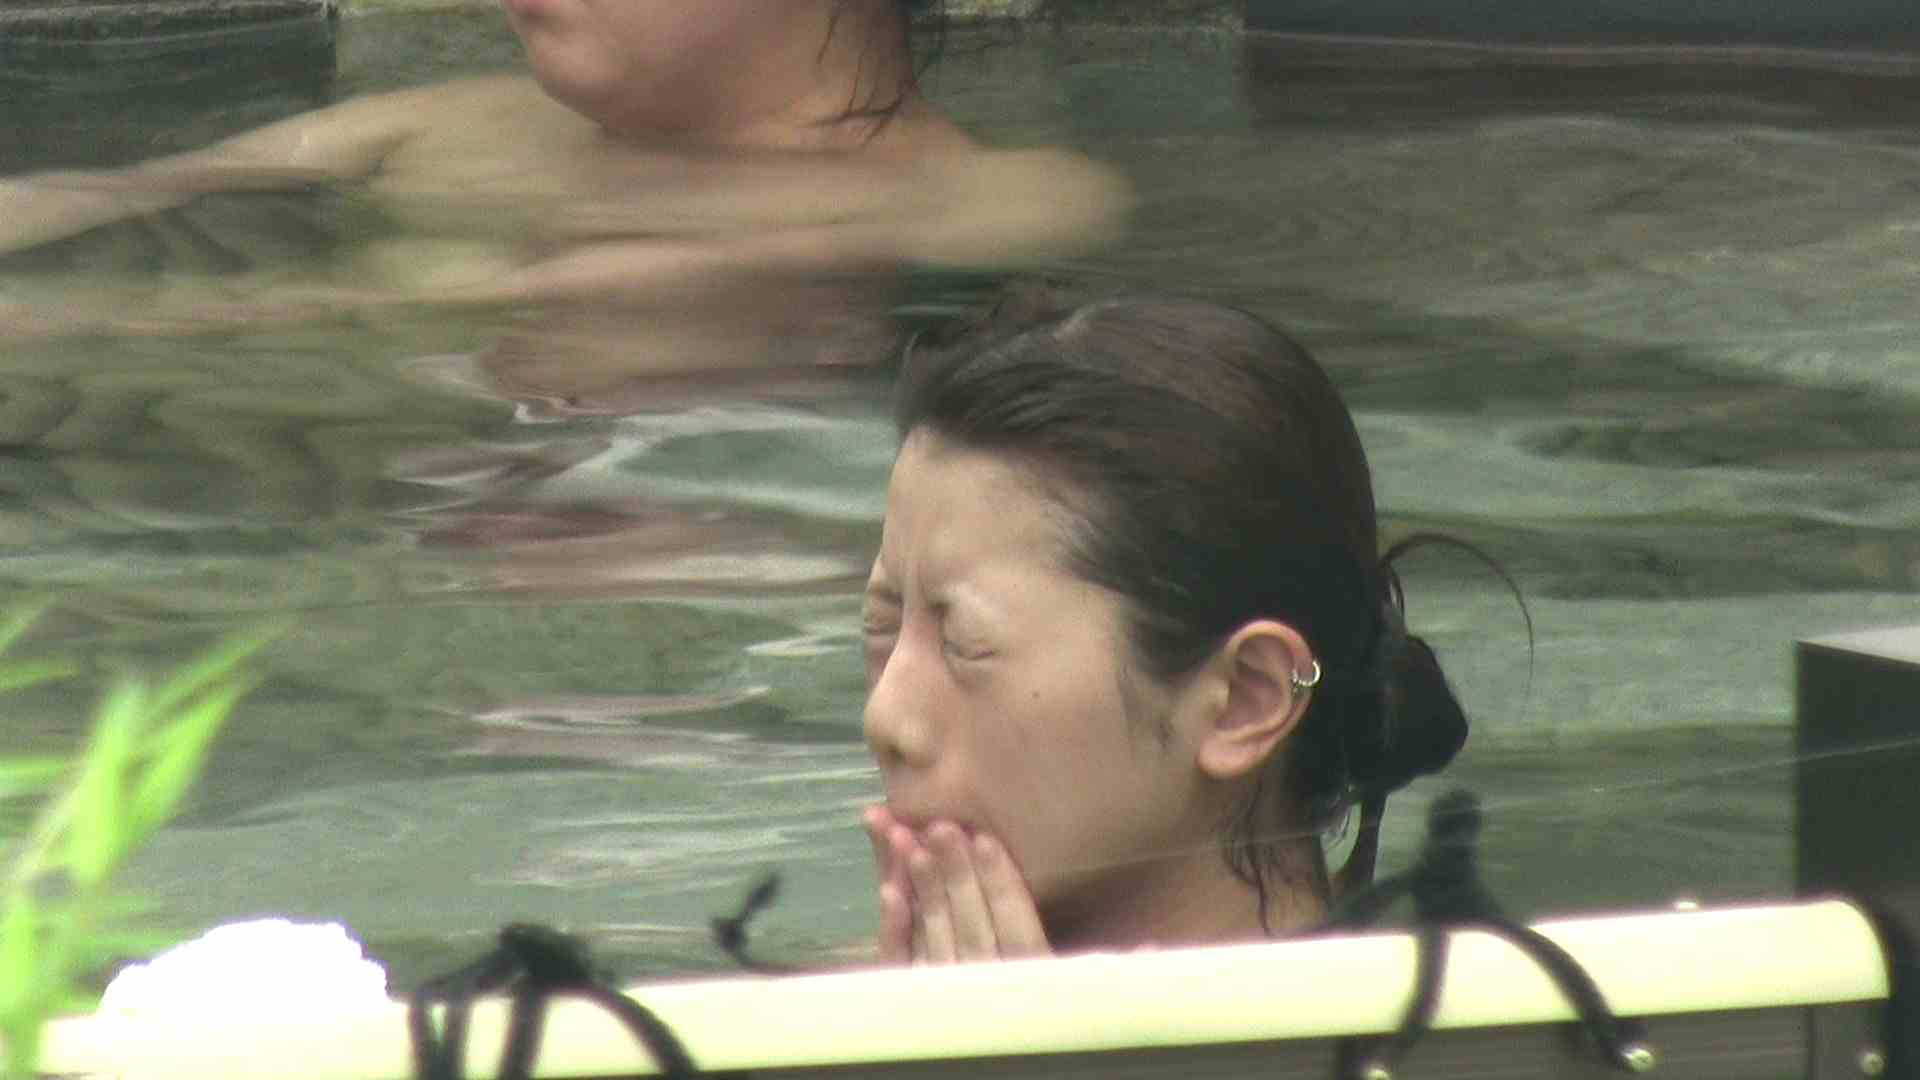 Aquaな露天風呂Vol.19【VIP】 盗撮 | HなOL  88pic 68